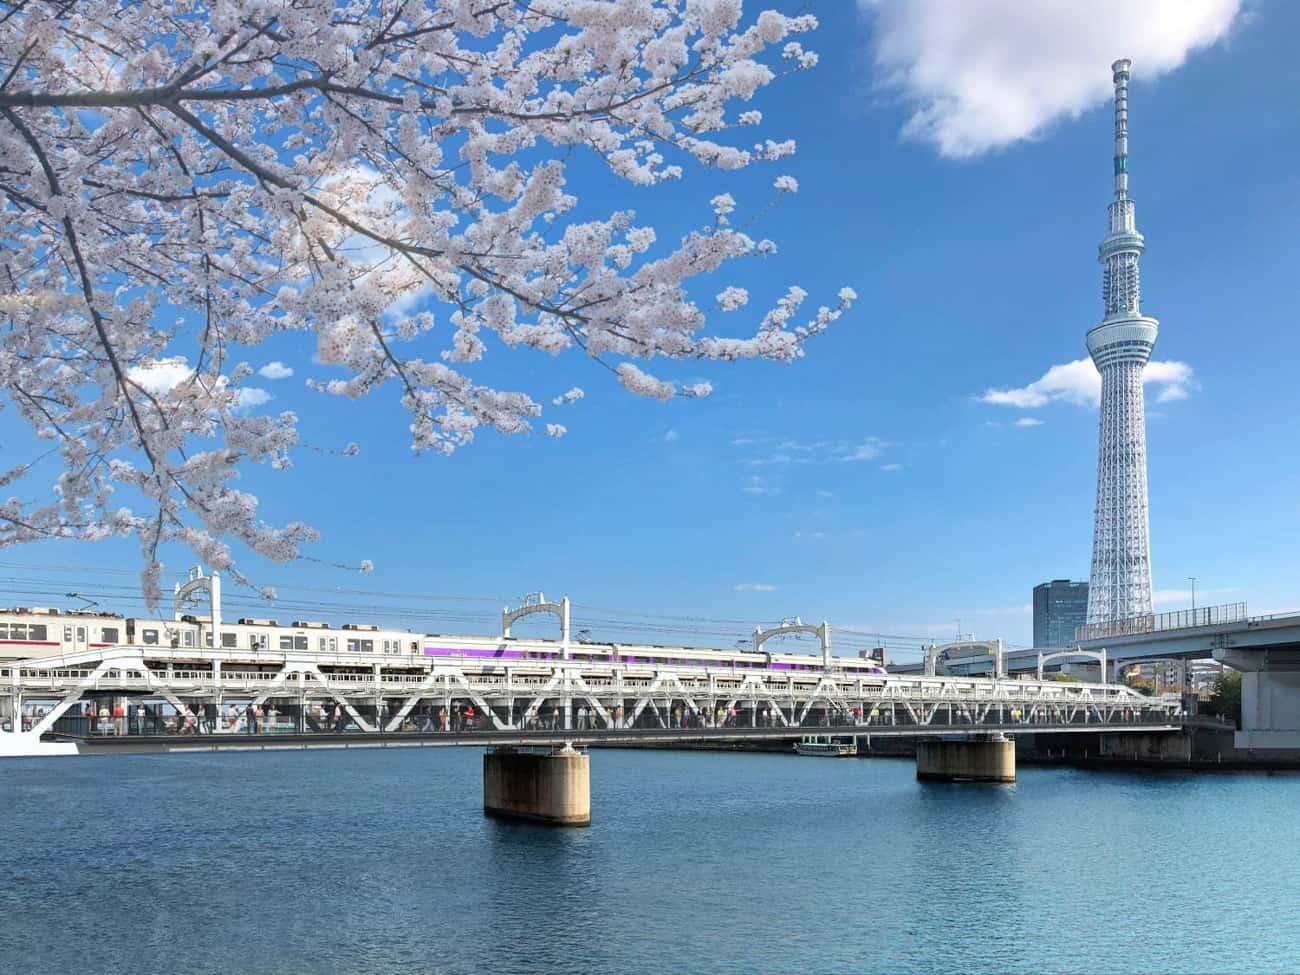 TOKYO Mizumachi ตั้งอยู่เลียบแม่น้ำสุมิดะ (Sumida River) ในกรุงโตเกียว